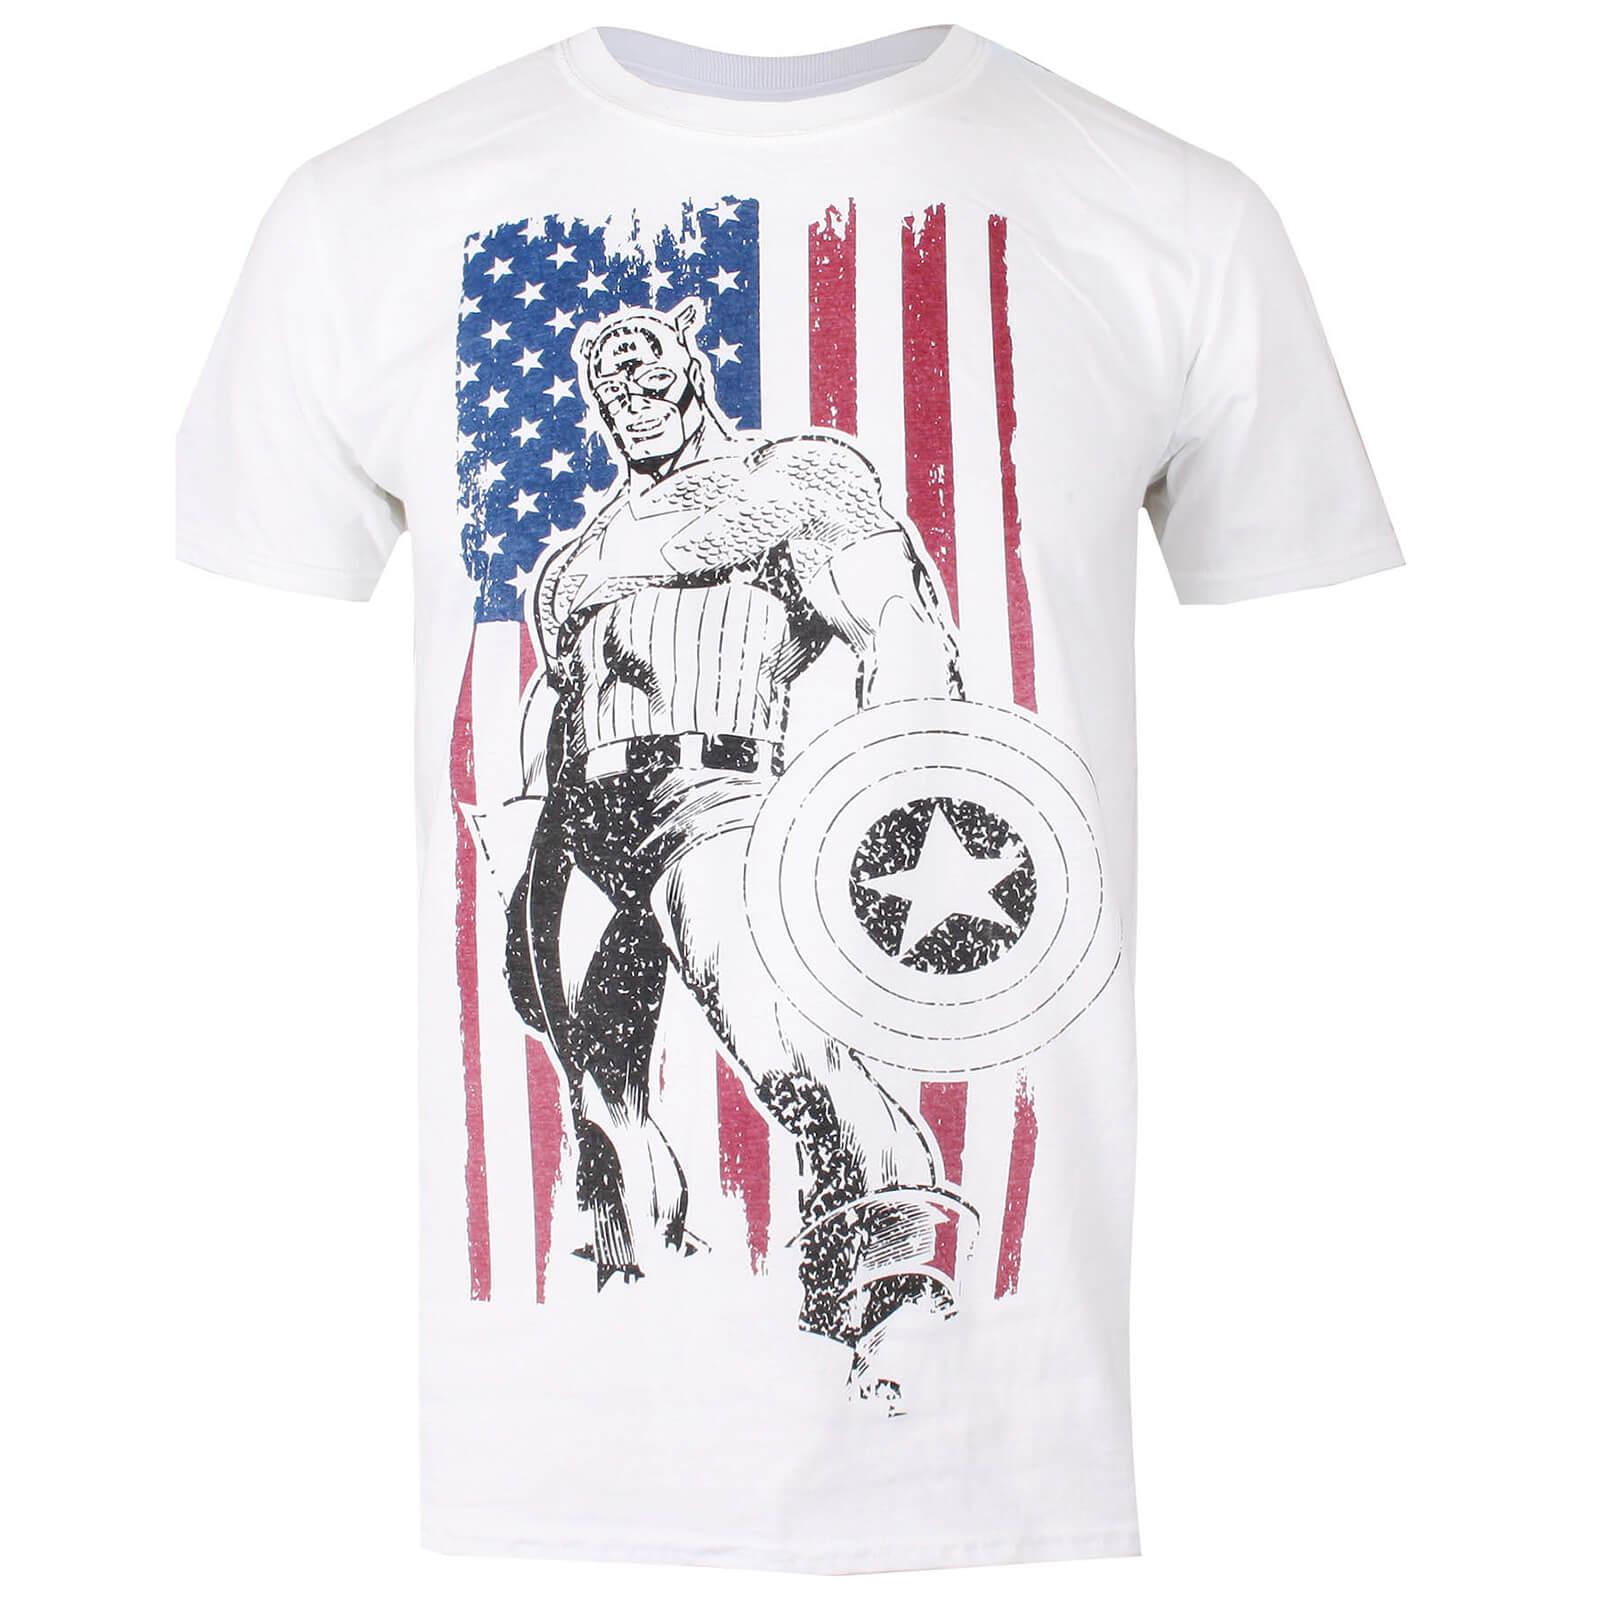 Marvel Mens Captain America Flag T Shirt White Merchandise Zavvi Us Fiction Blouse With Obi Off Men